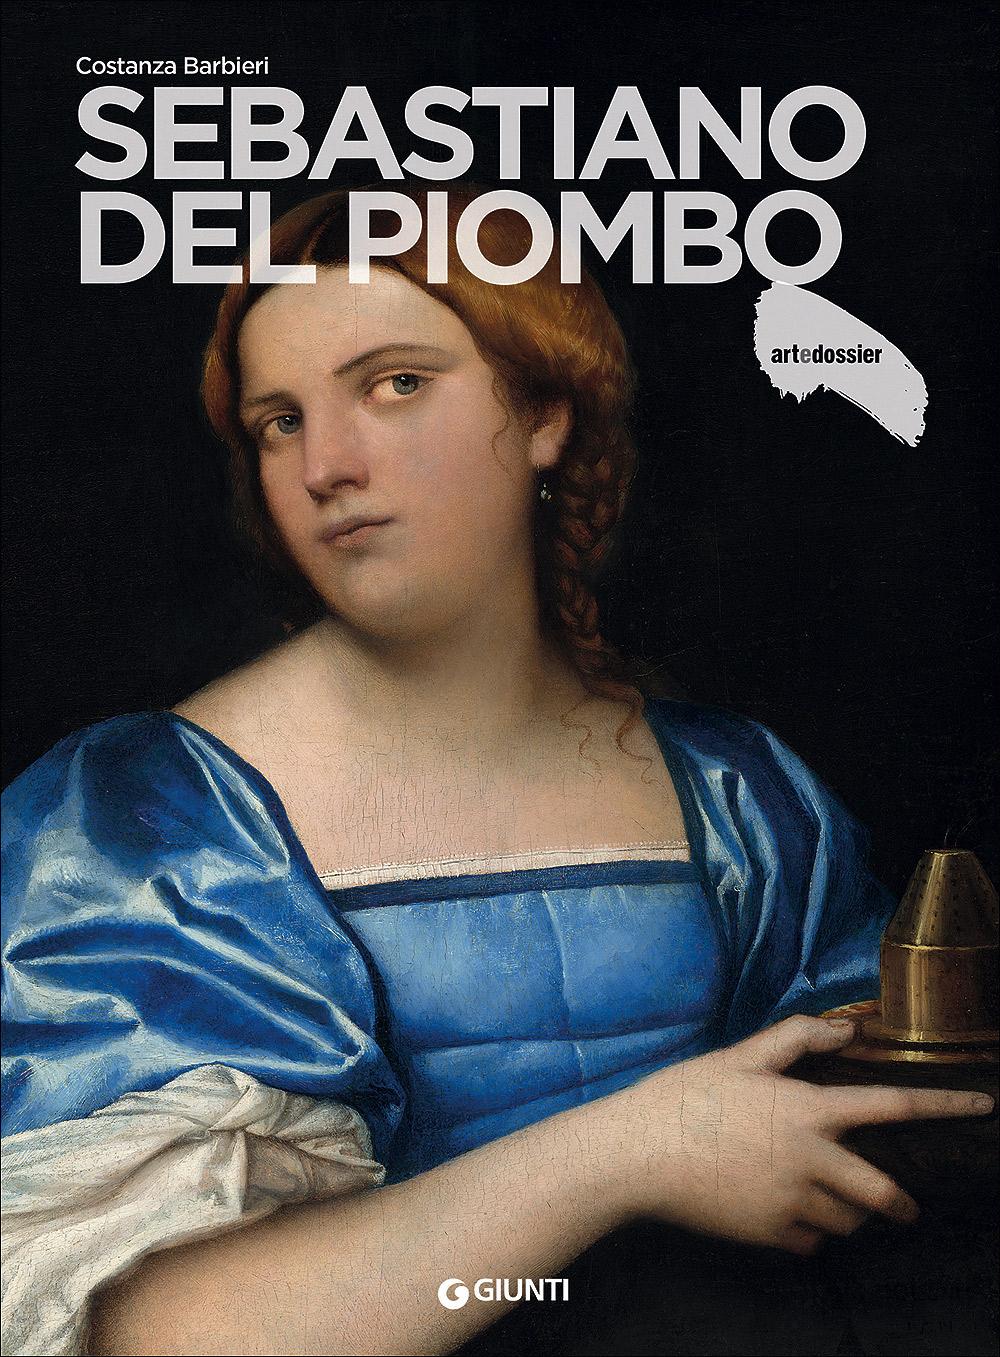 Sebastiano del Piombo